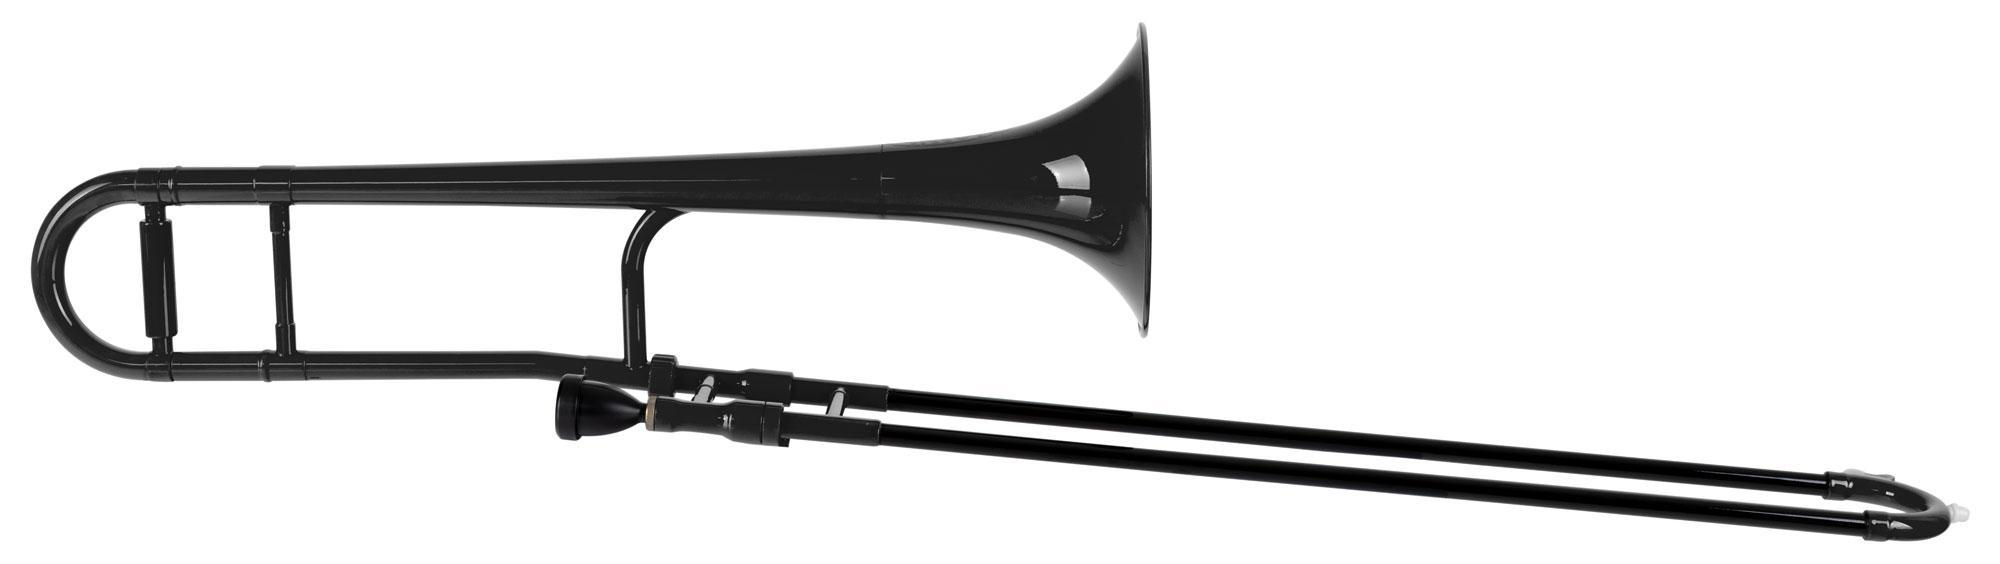 Posaunen - Classic Cantabile MardiBrass Kunststoff Bb Tenorposaune Jazzposaune schwarz - Onlineshop Musikhaus Kirstein